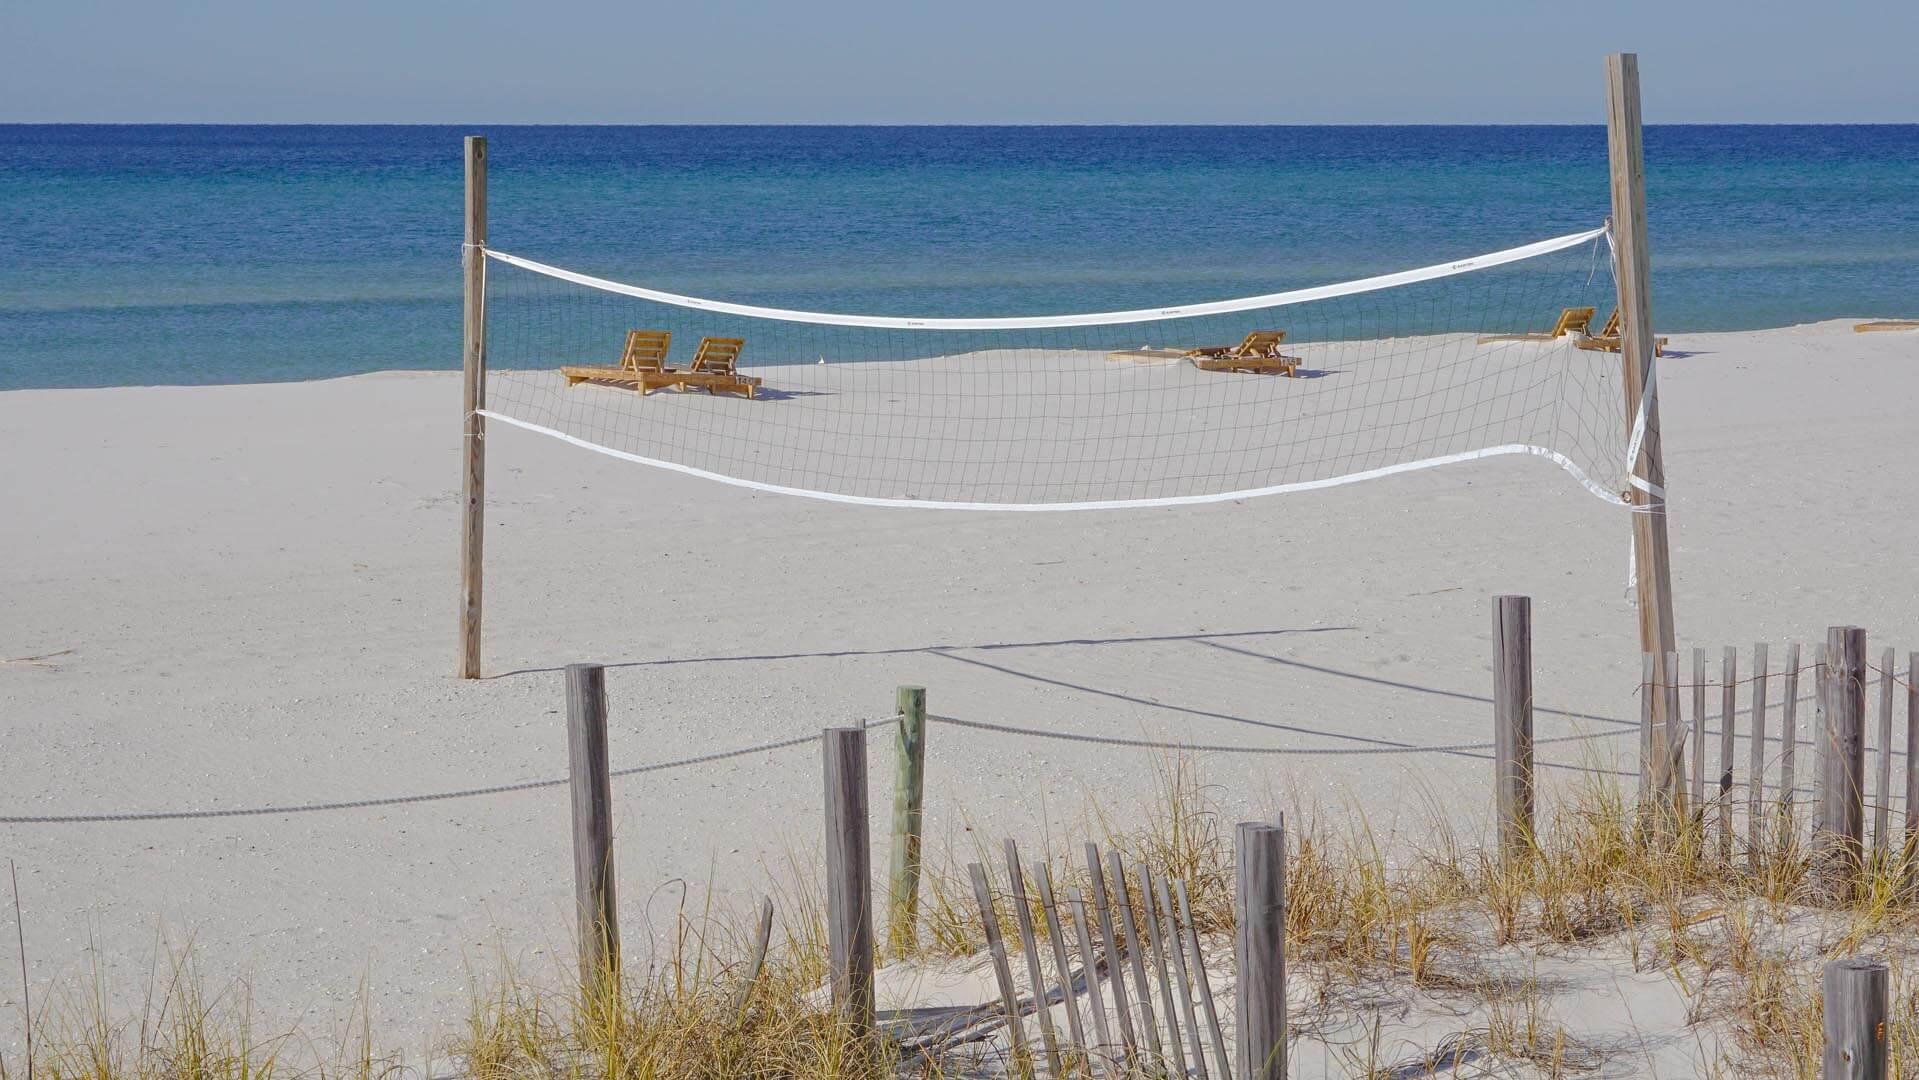 Landmark Holiday Beach Resort Volleyball